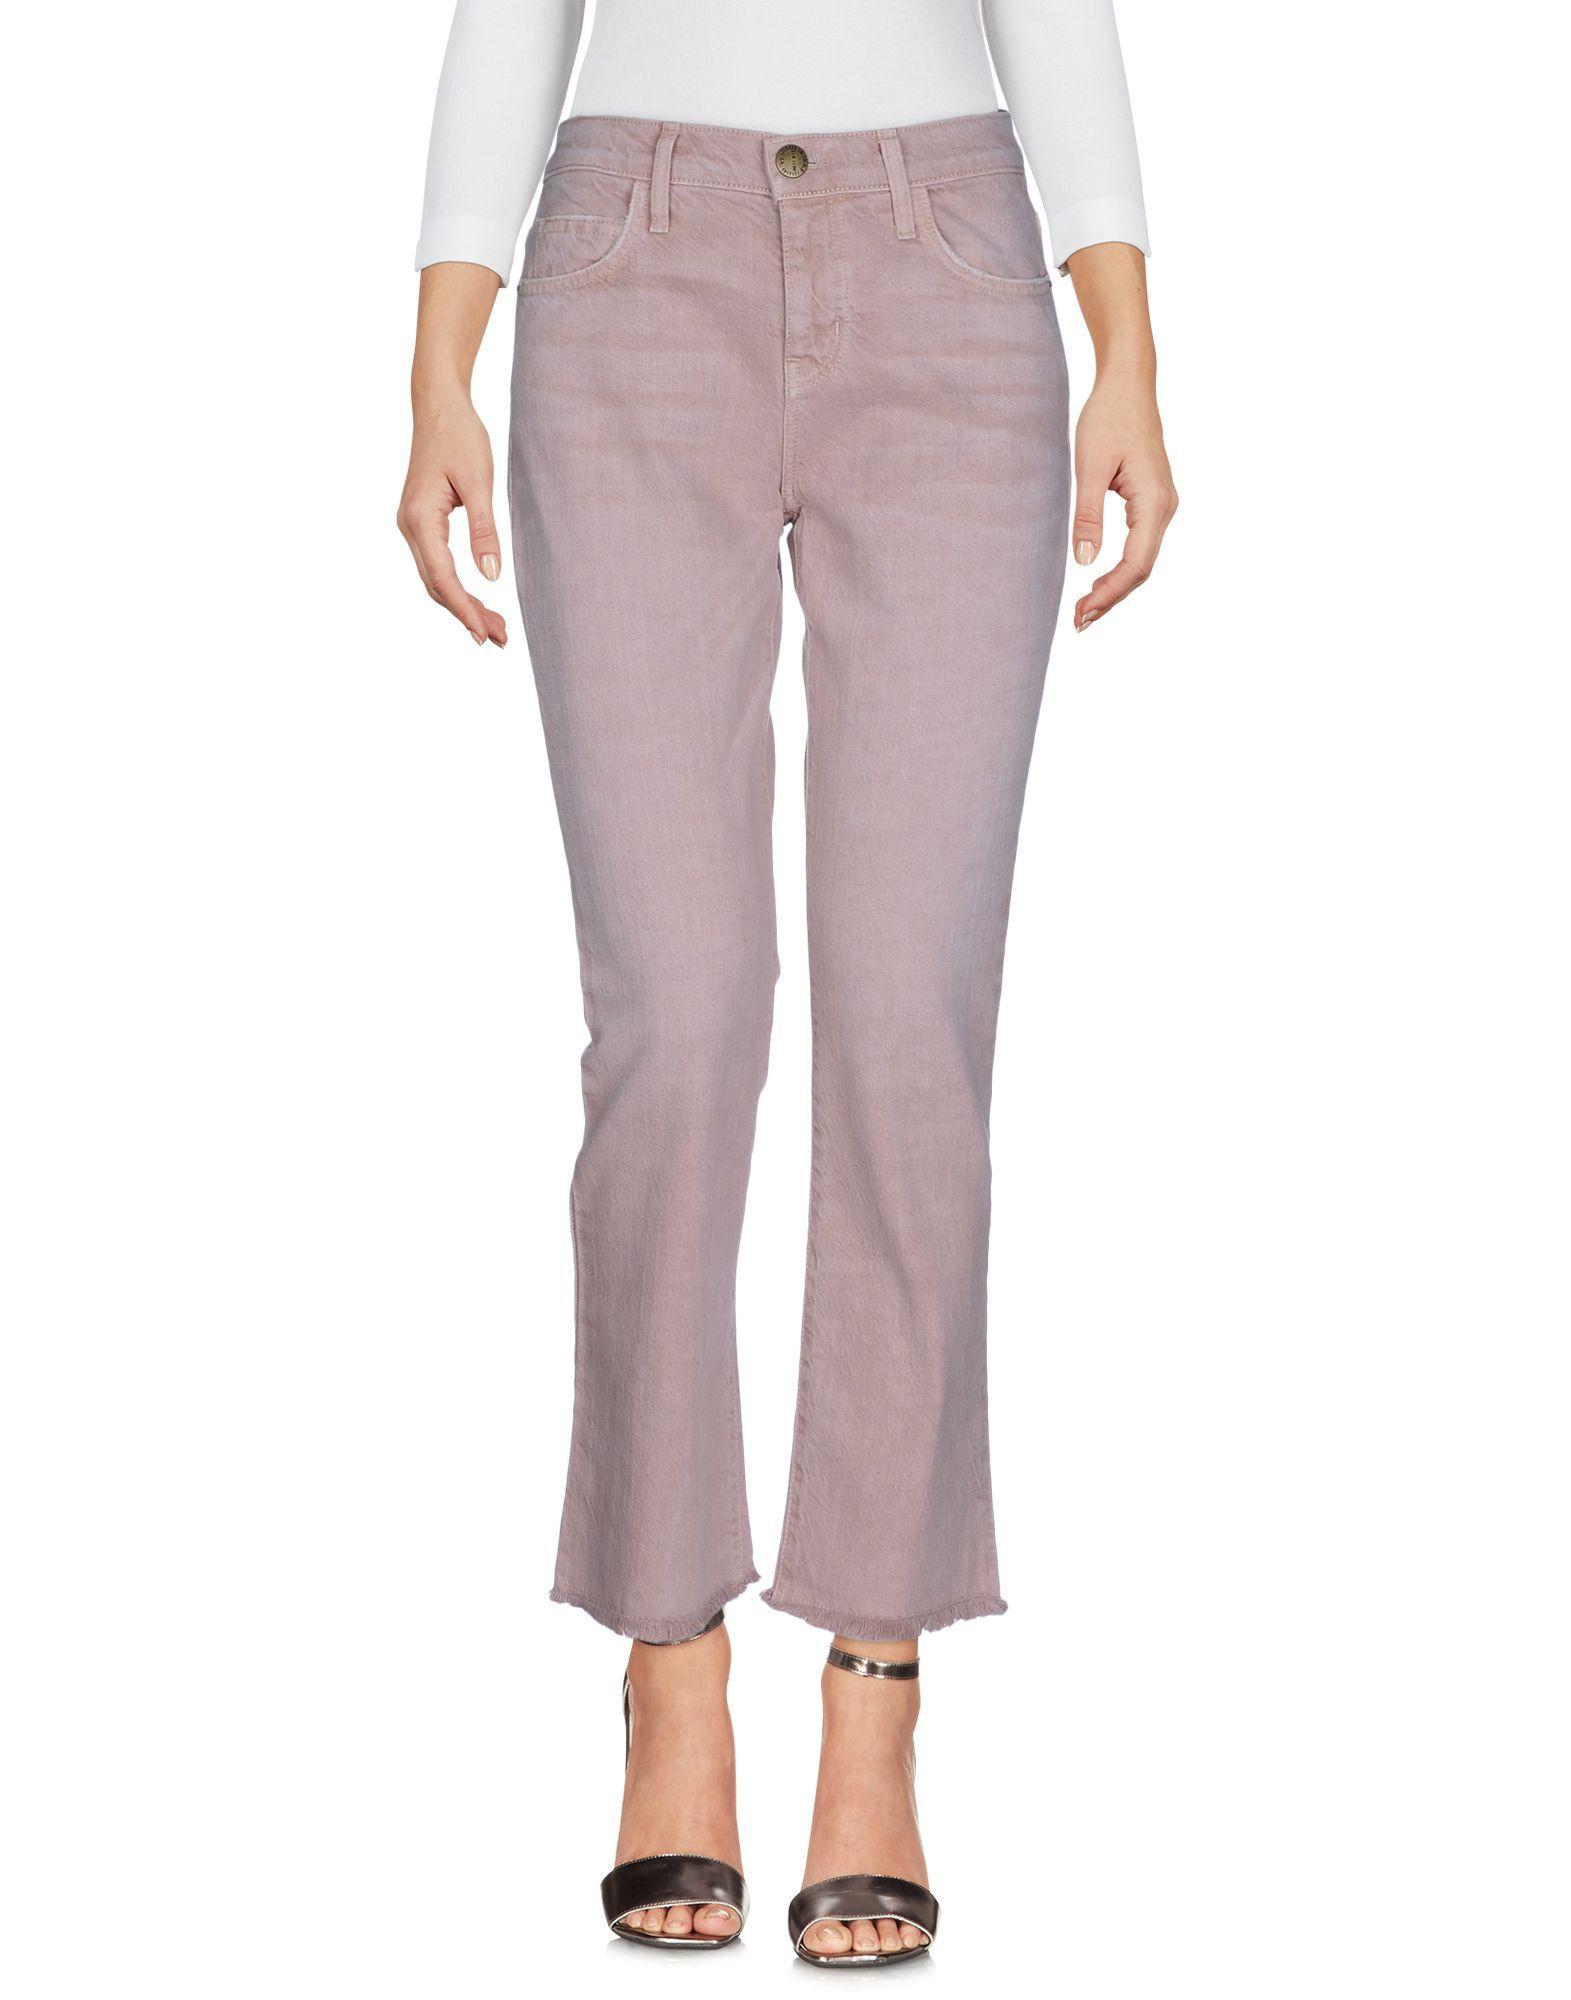 Current/Elliott Light Brown Cotton The Kick Jeans